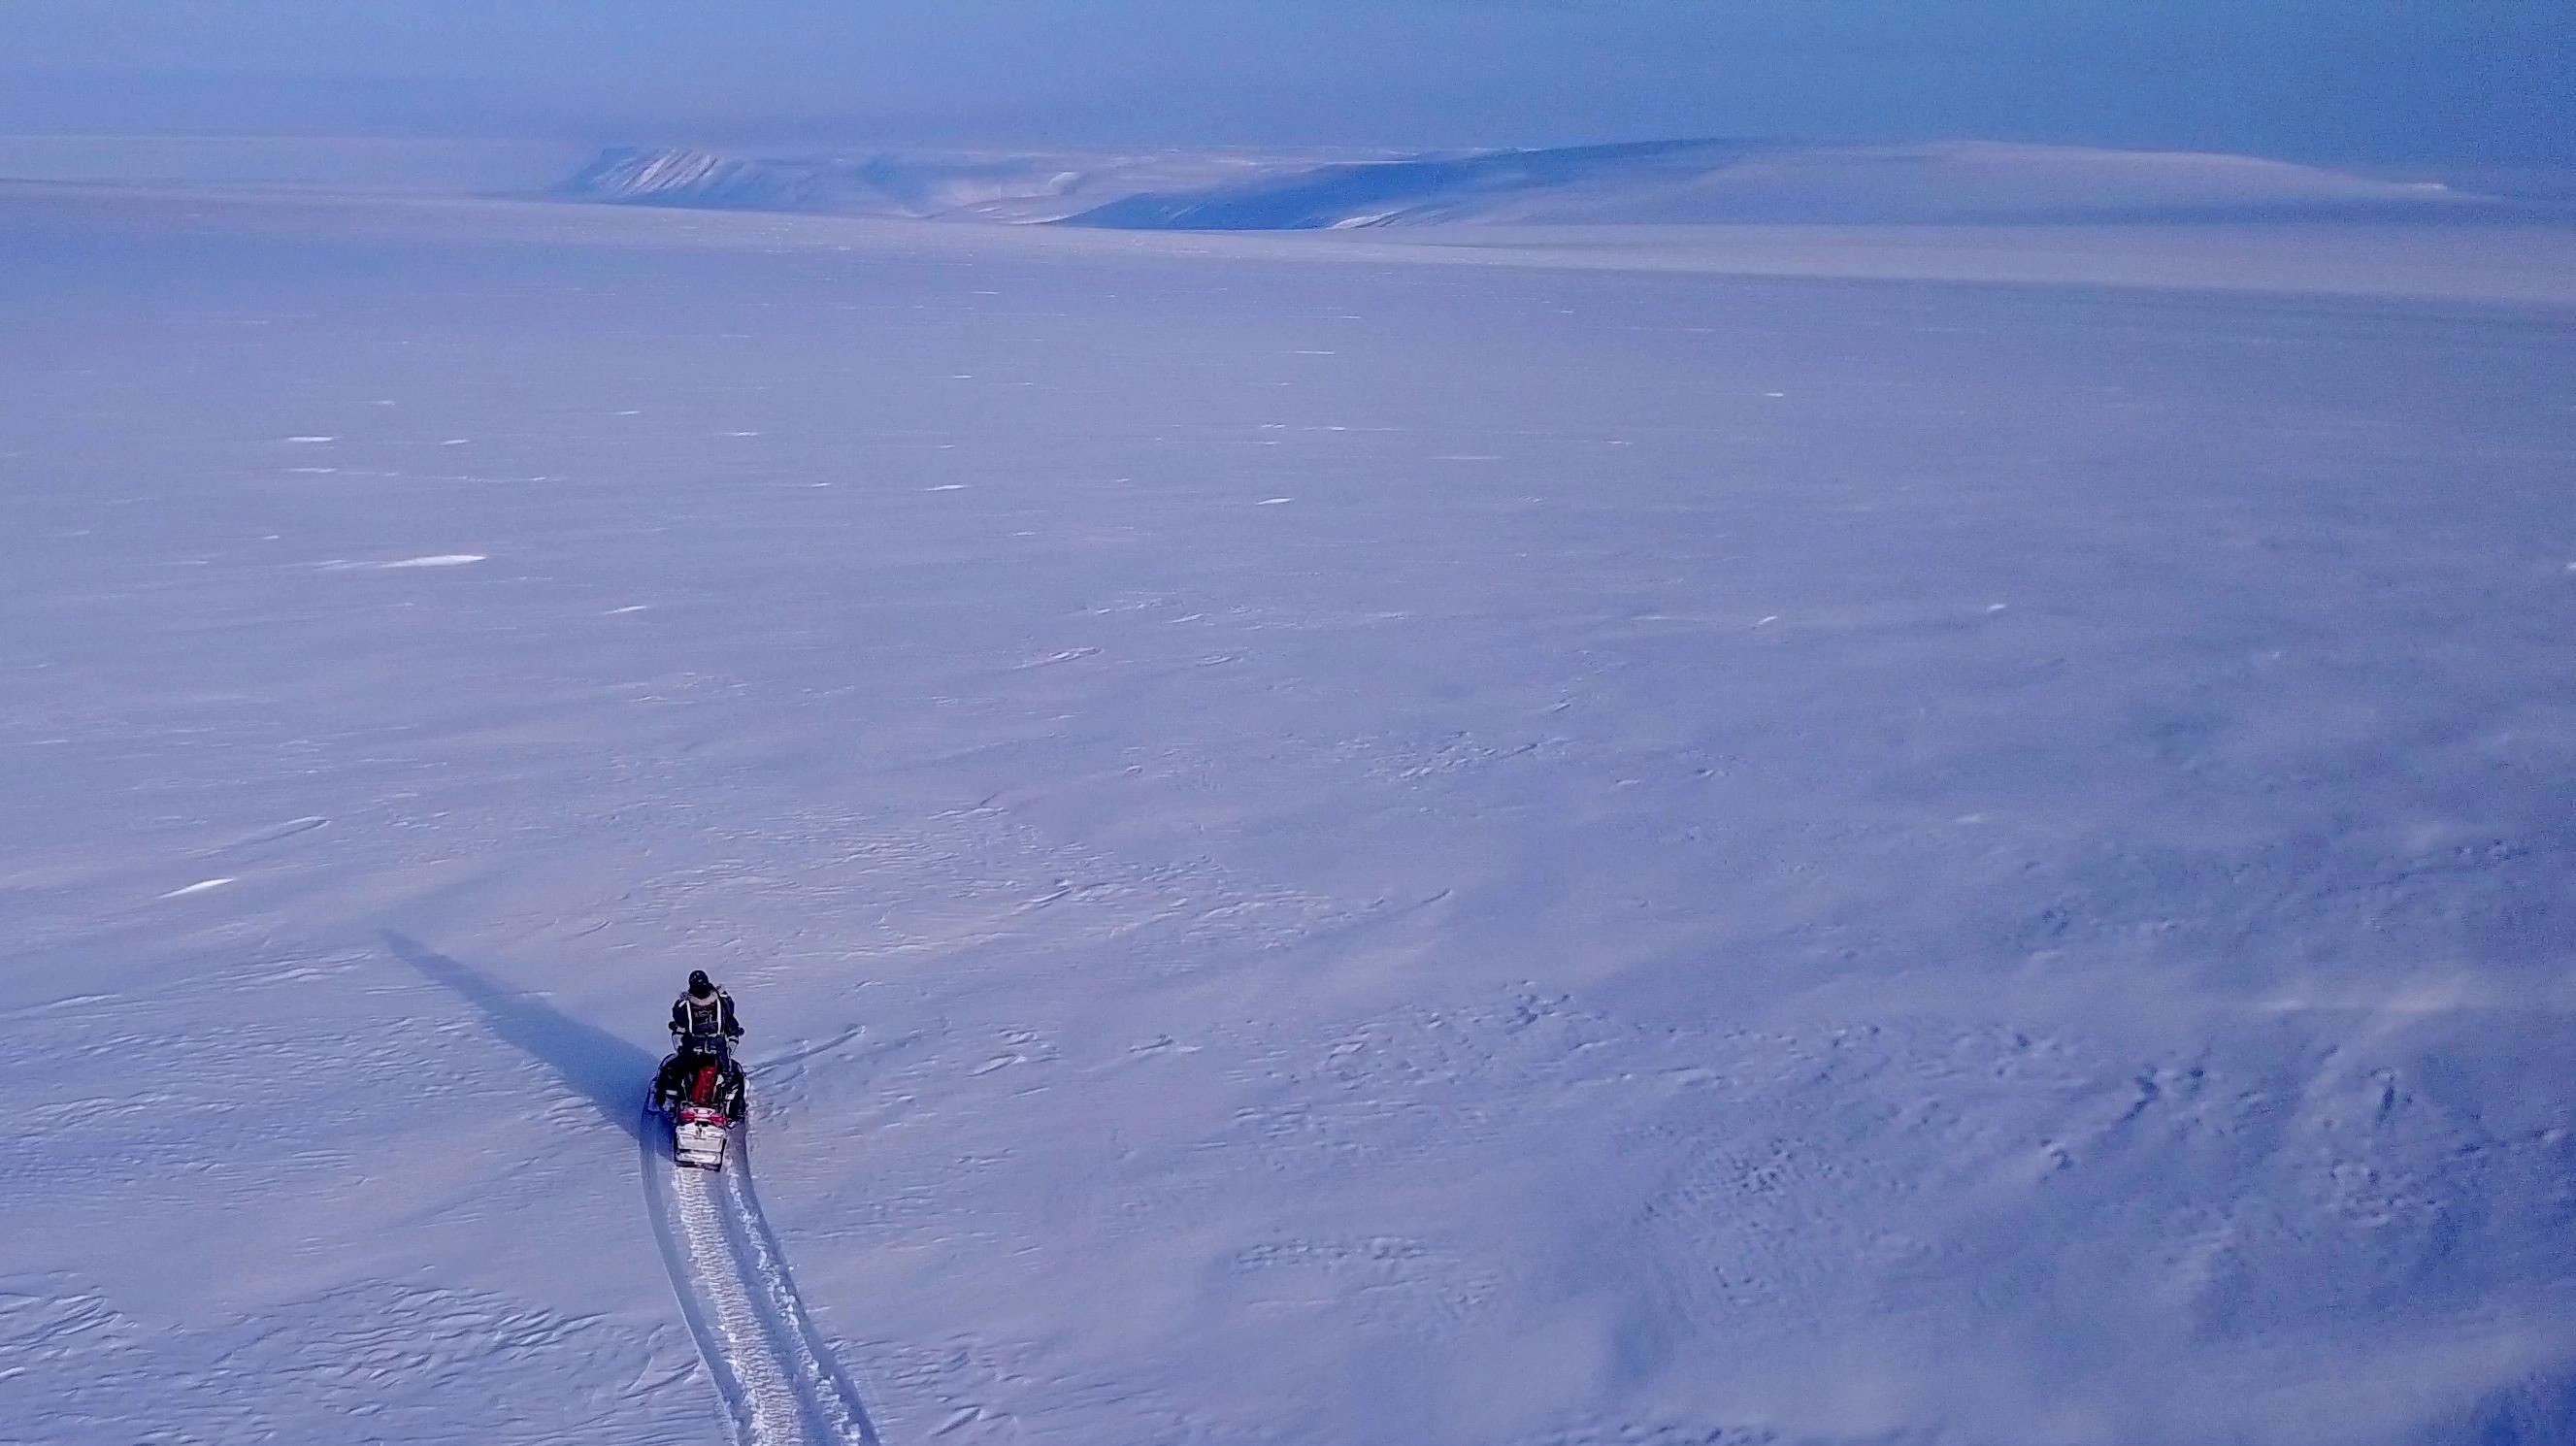 Fresh snow on Ulverbreen, Svalbard